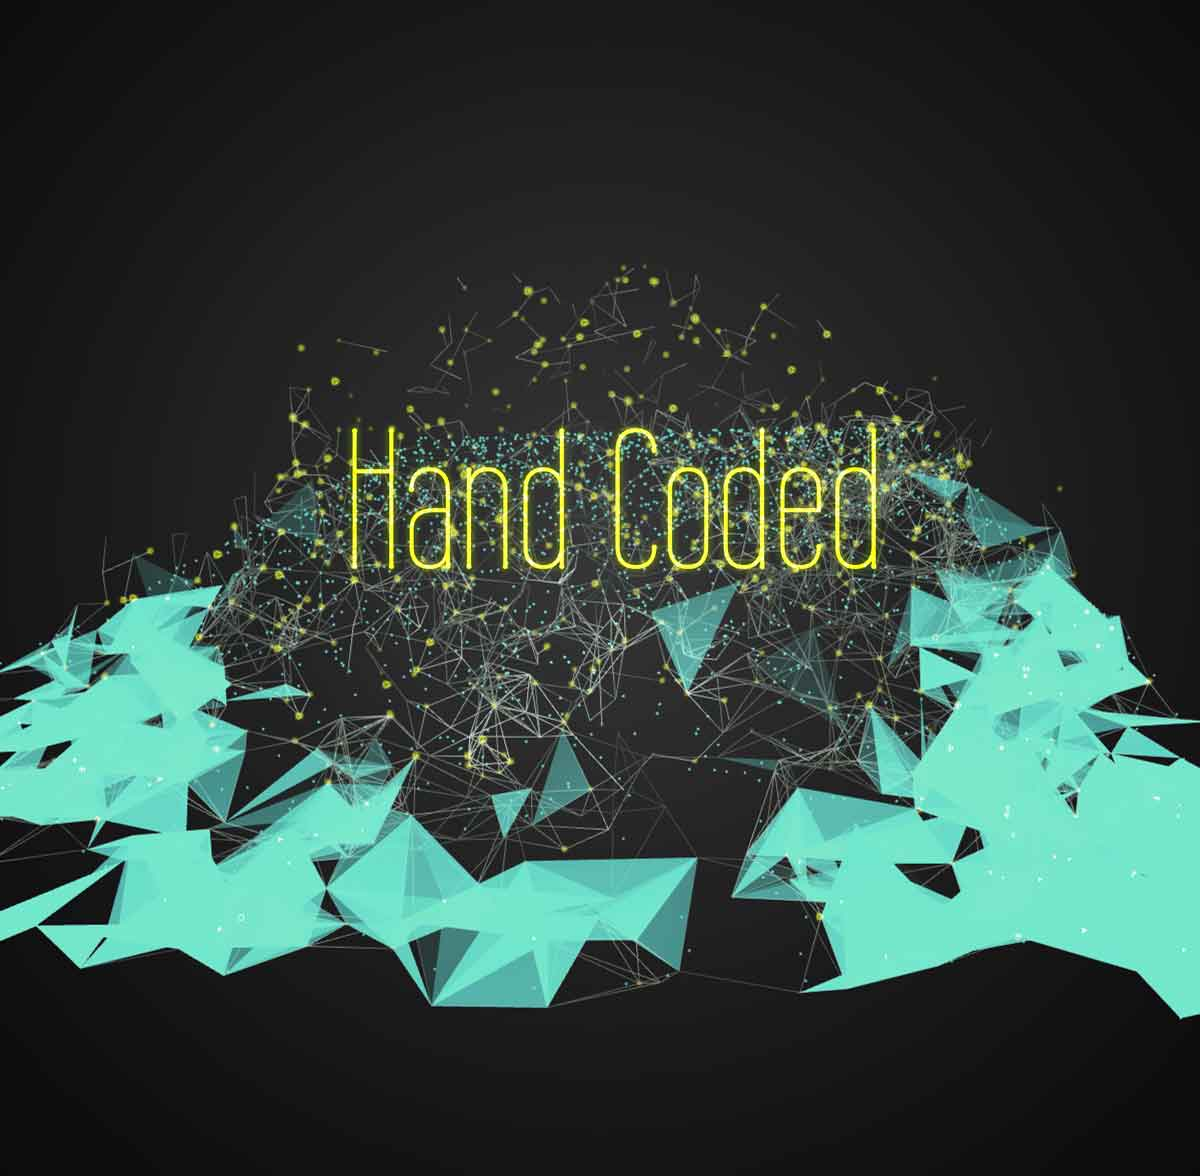 handCoded4.jpg